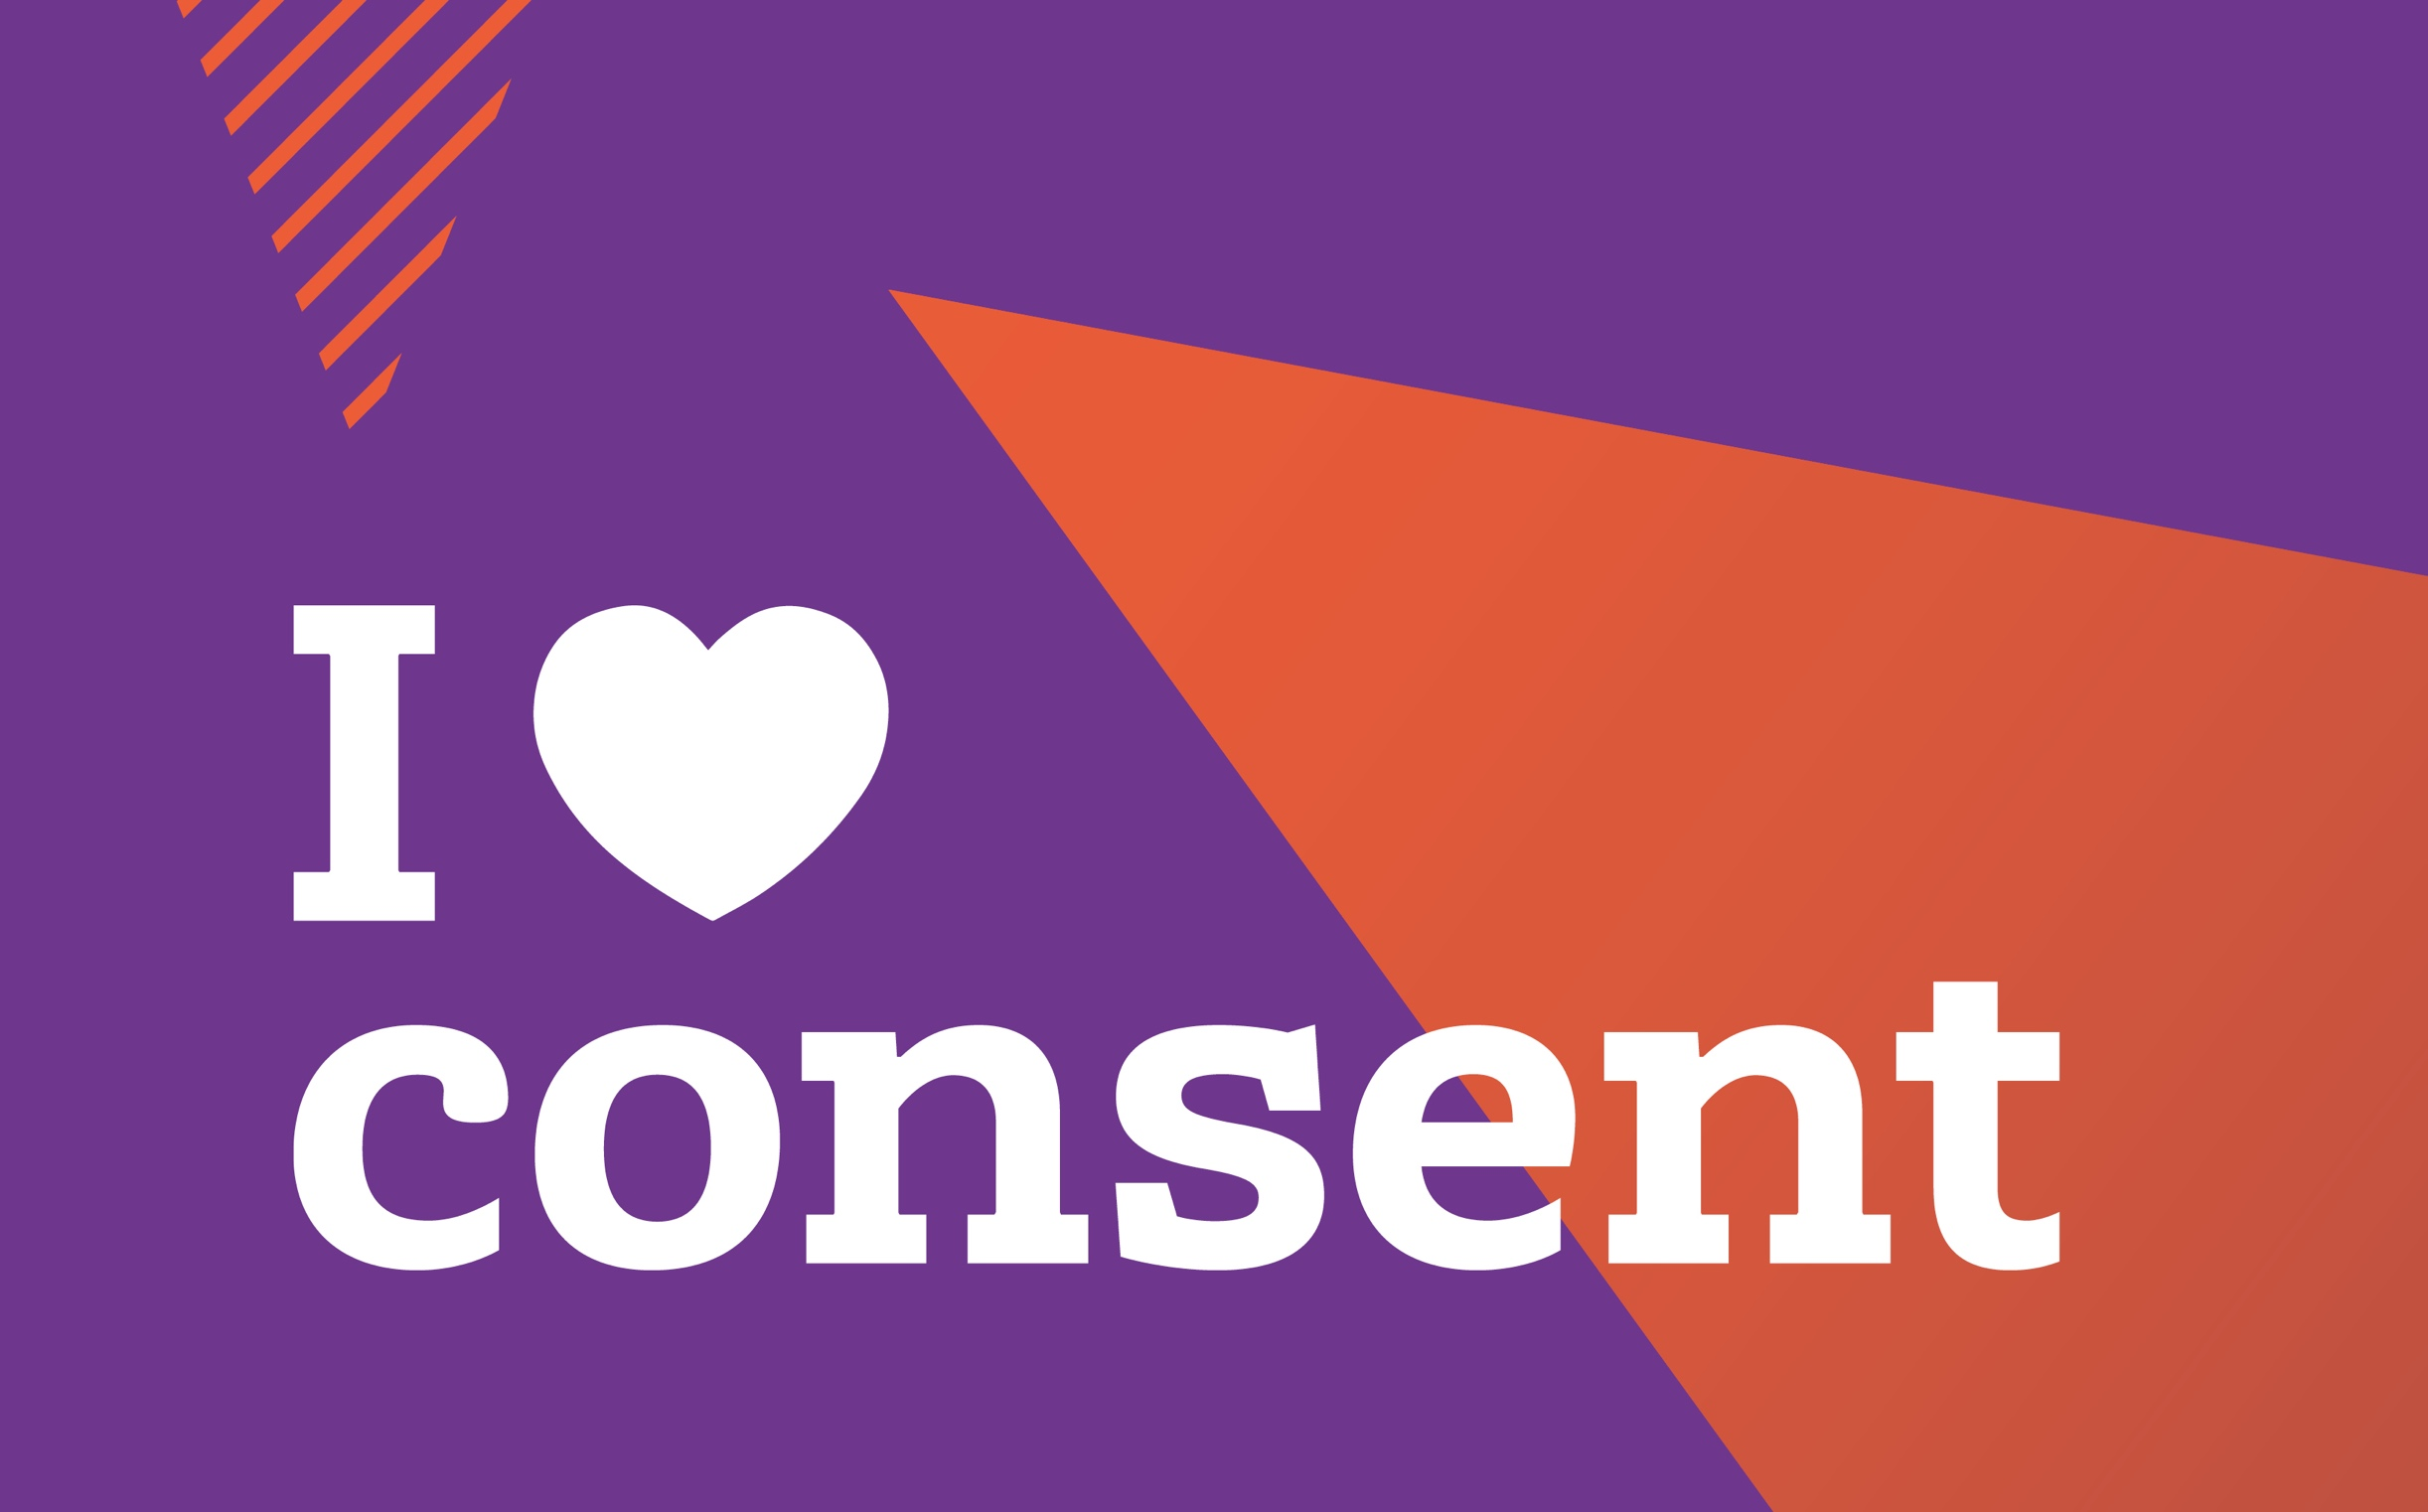 I heart consent